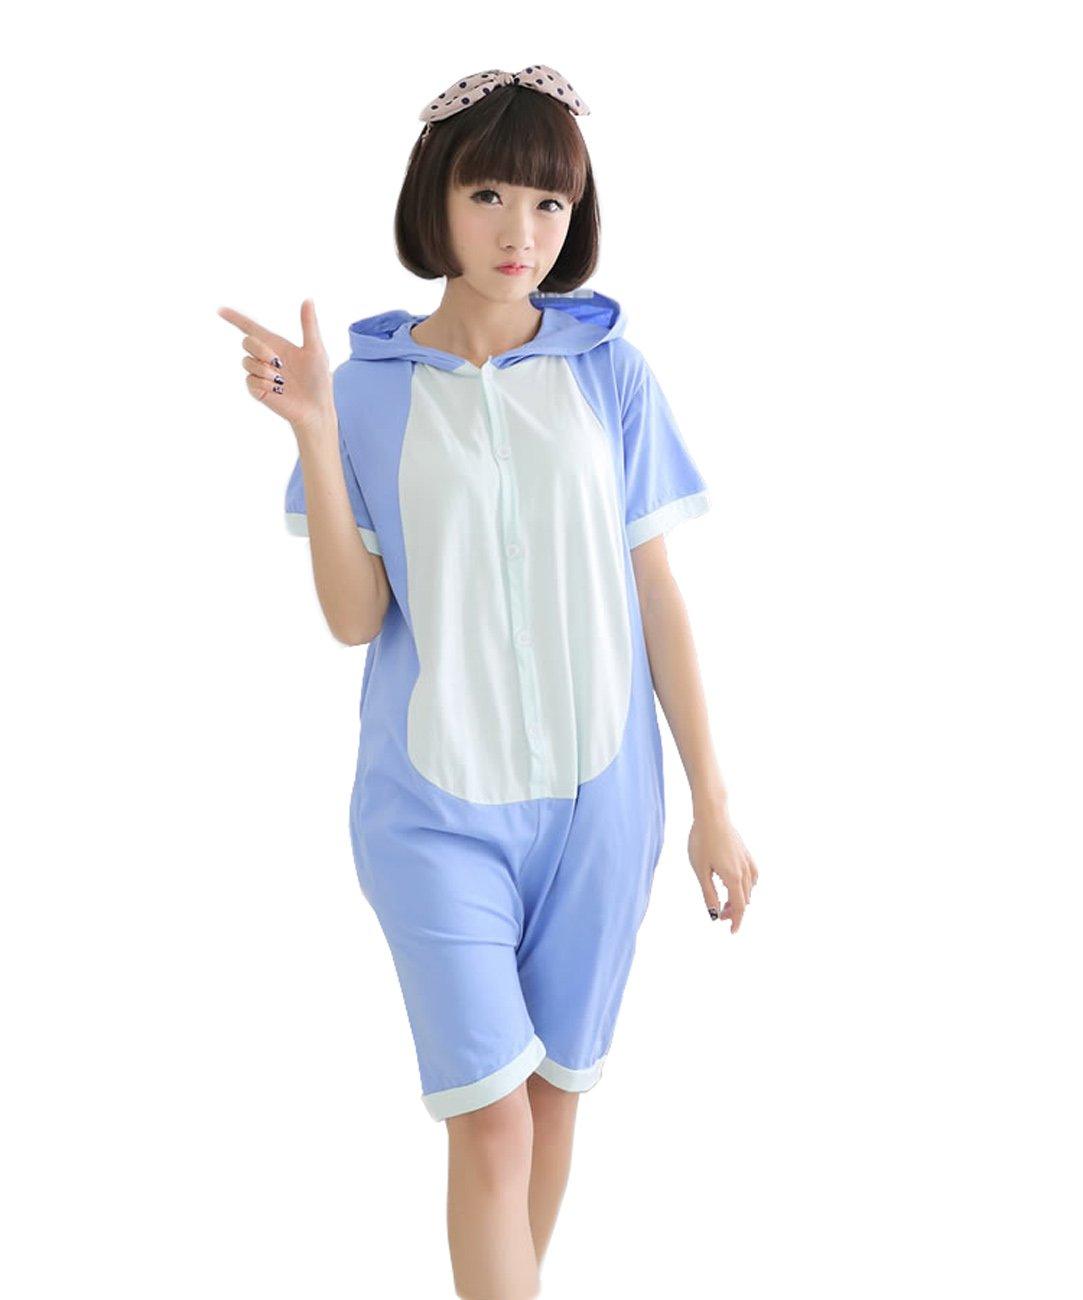 Yimidear Unisex Stitch Costume Summer Cute Cartoon Cotton Pajamas Animal Onesie (L) by Yimidear (Image #1)